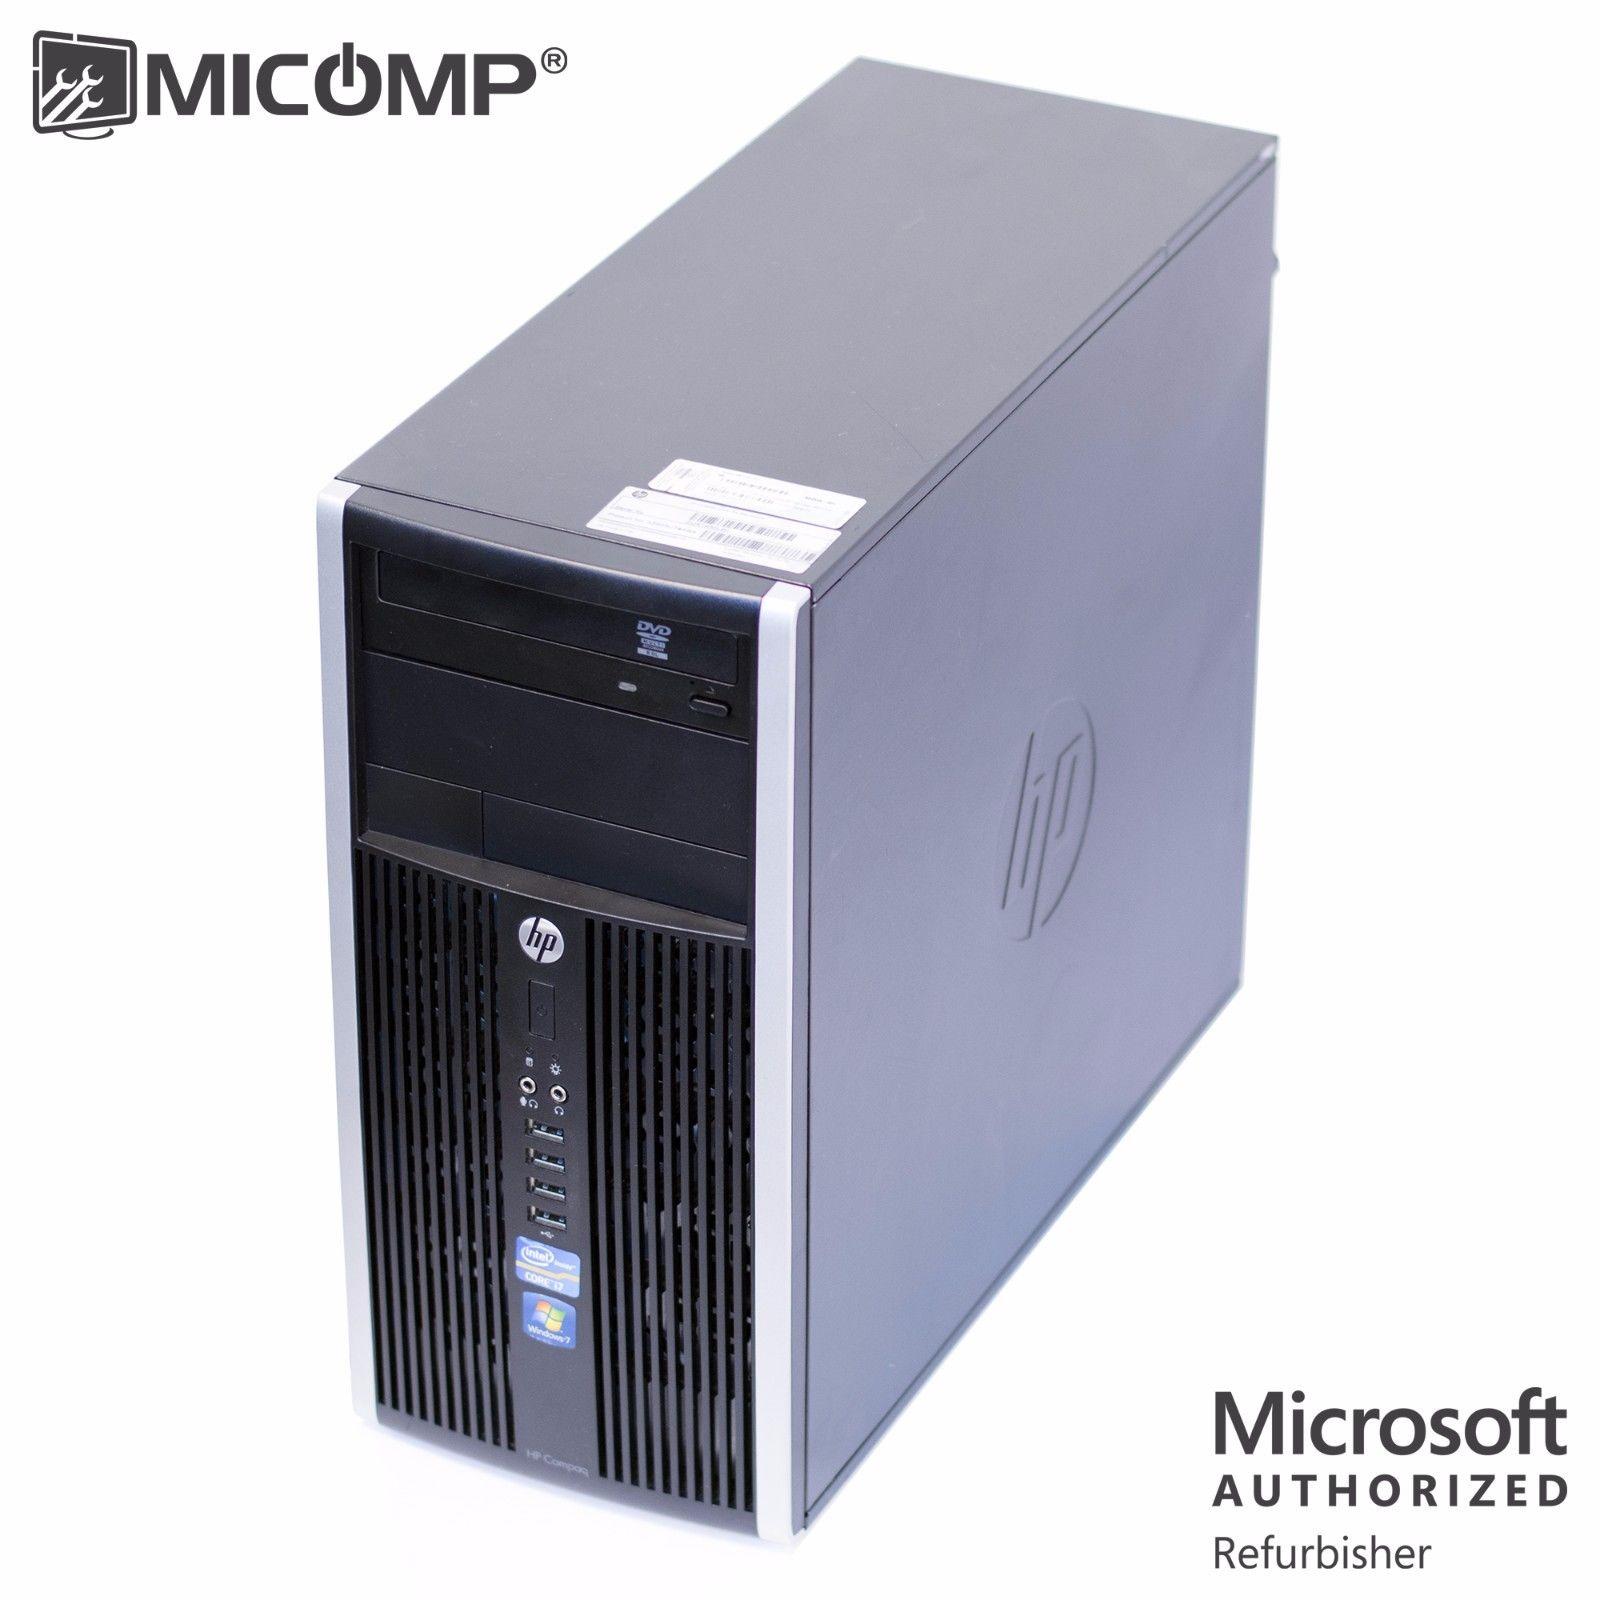 HP Gaming Computer Nvidia GTX 1050 Video Core i5 3.2Ghz 16Gb 1TB HDD Windows 10 HDMI WiFi 1 Year Warranty 1